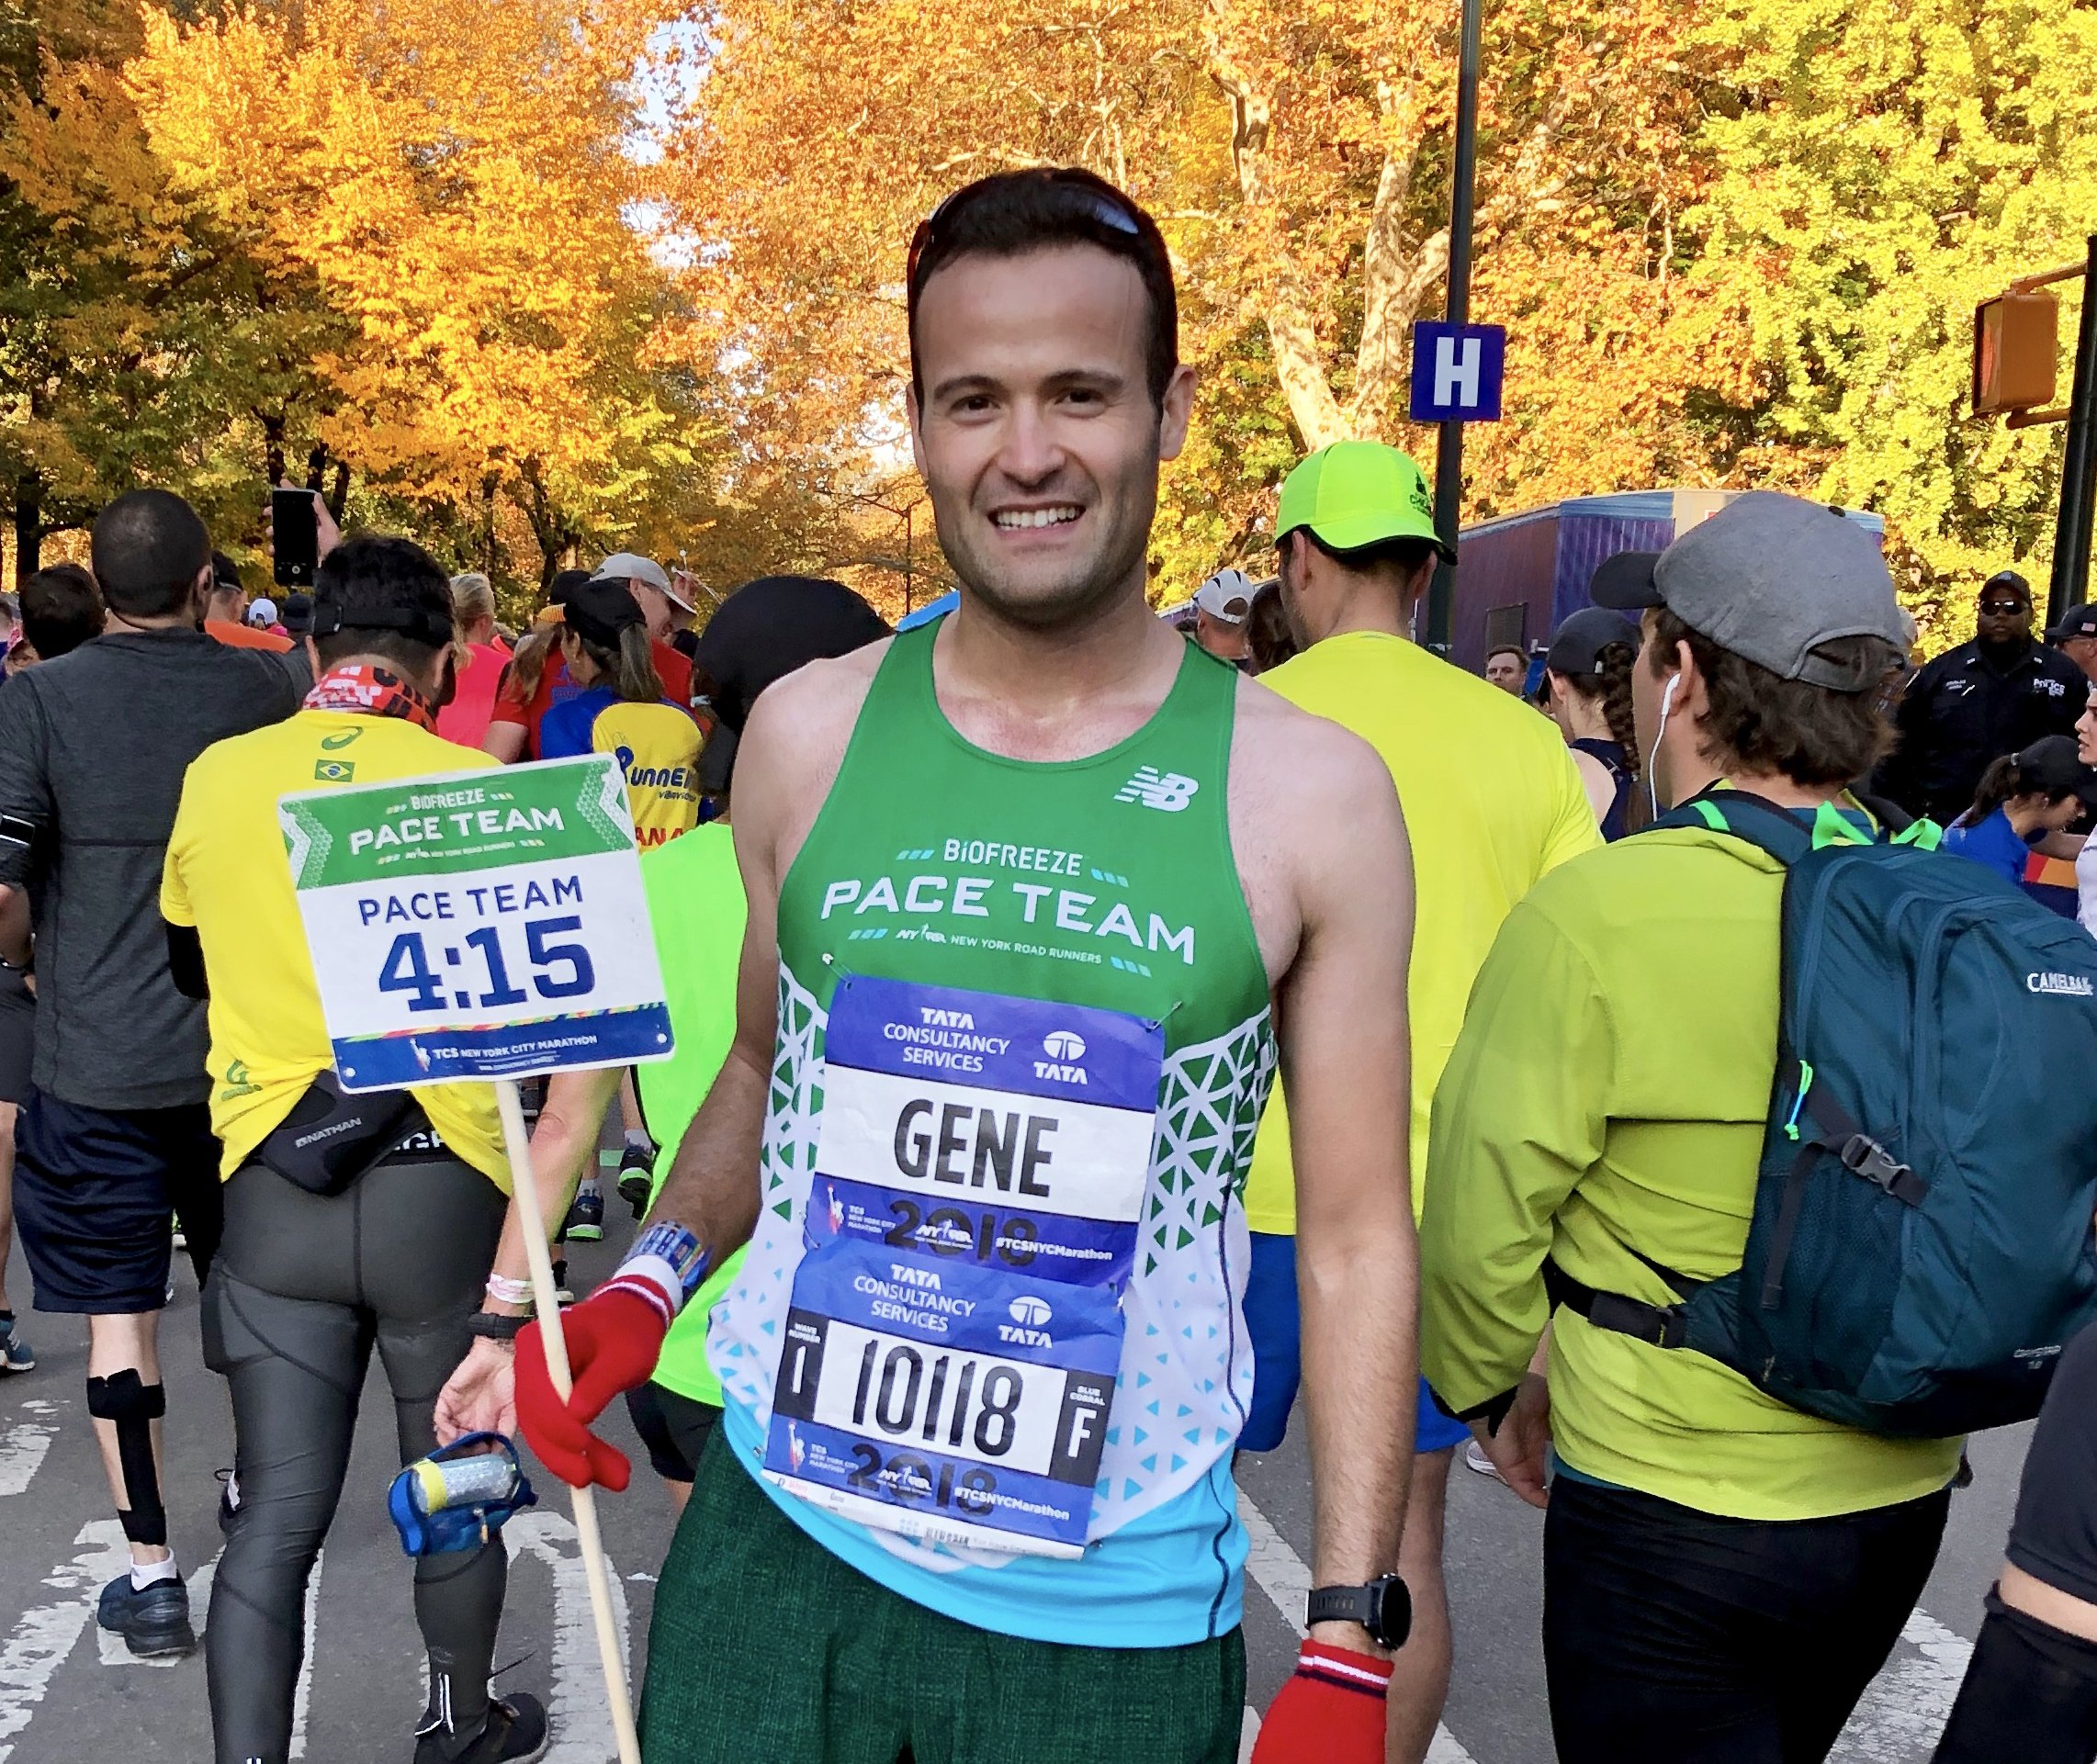 Pace team member Gene Sobol